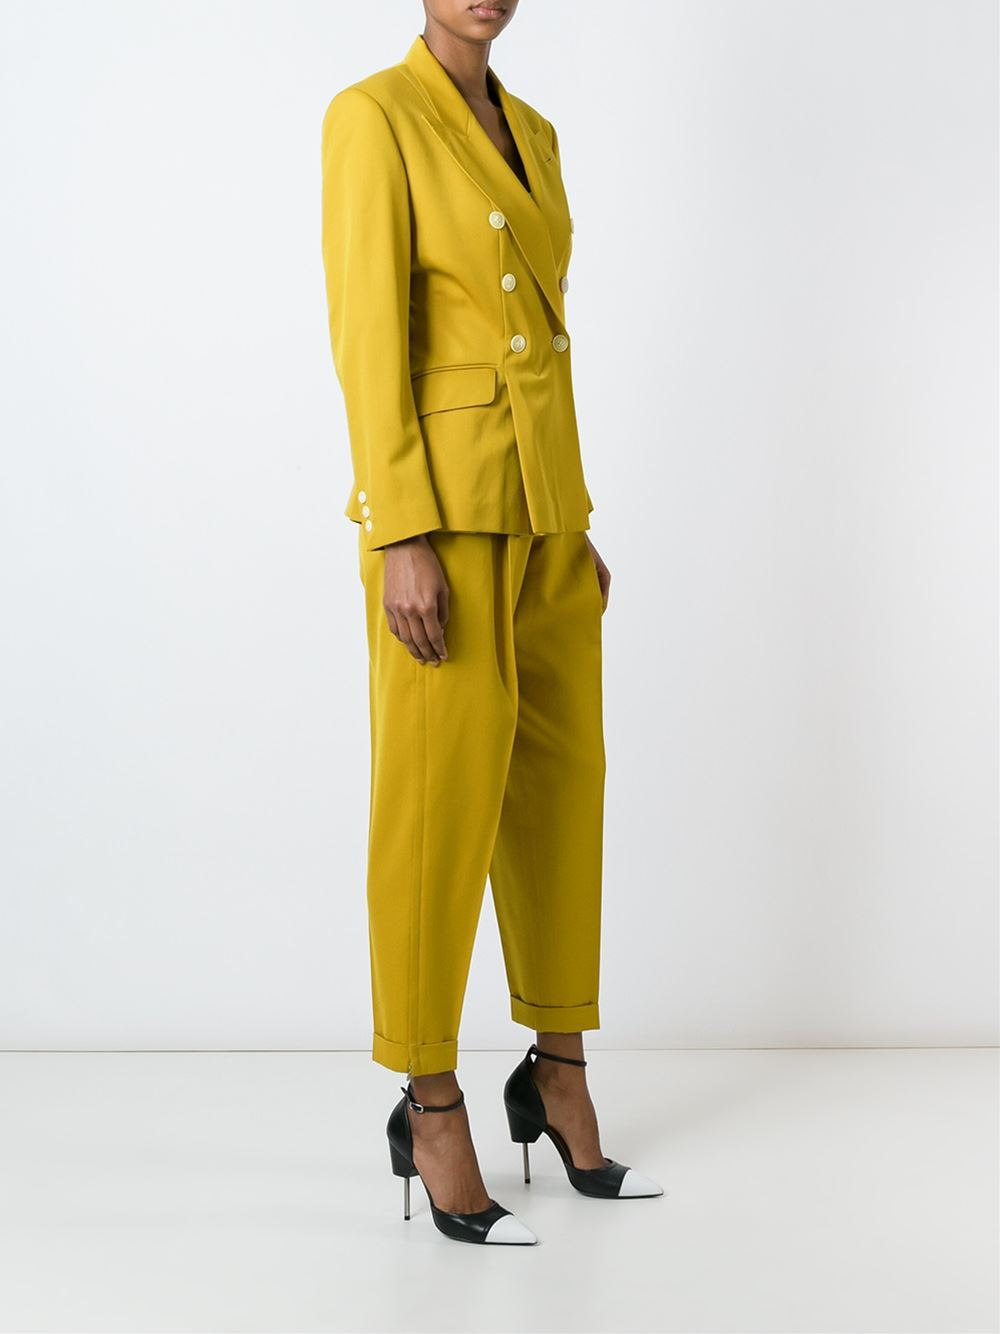 jean paul gaultier two piece trouser suit lyst. Black Bedroom Furniture Sets. Home Design Ideas